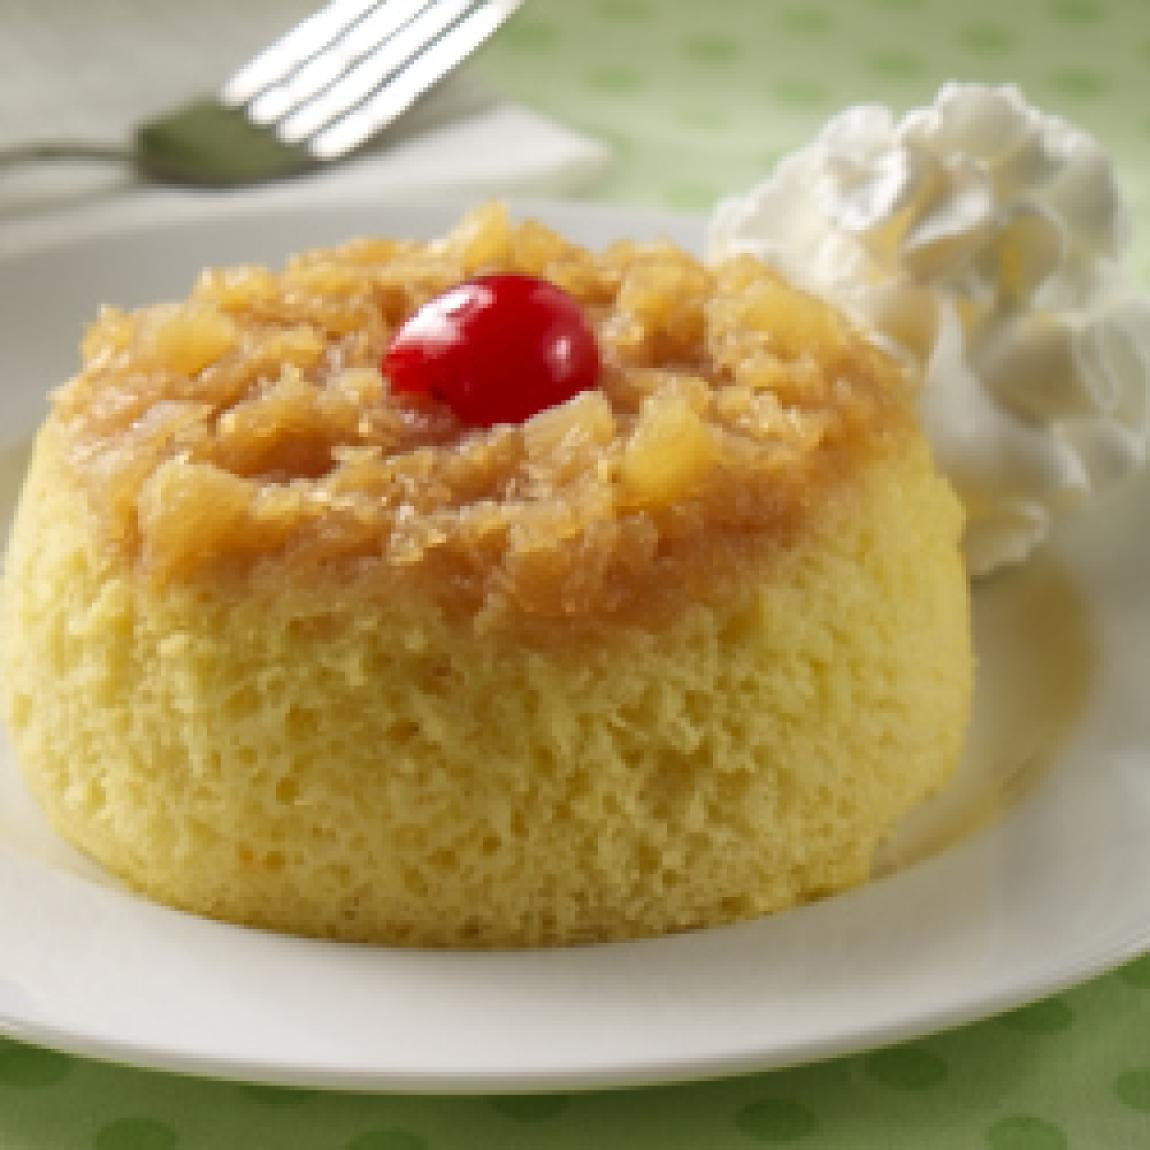 Pineapple Upside Down Cake Using Cake Mix And Crushed Pineapple  Pineapple Upside Down Mug Cakes Recipe